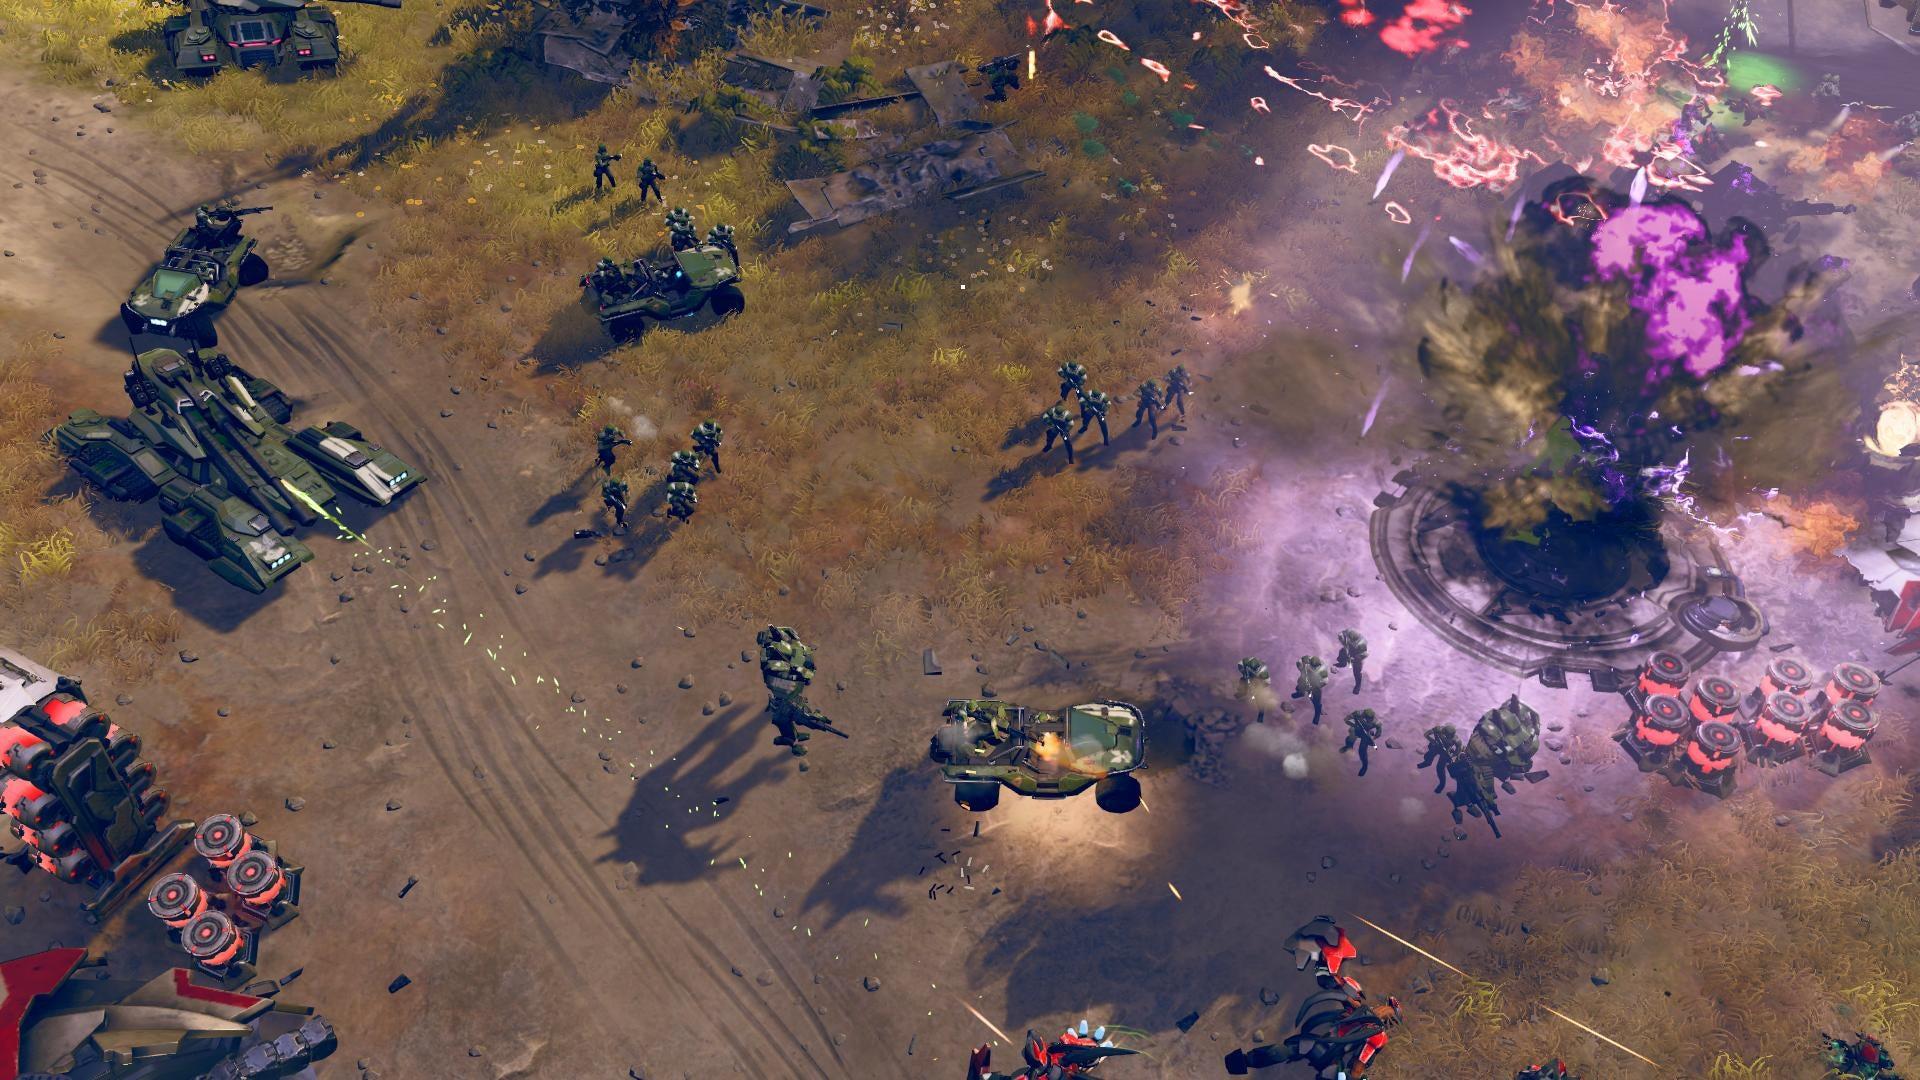 Halo Wars 2 Getting An Open Beta Next Week